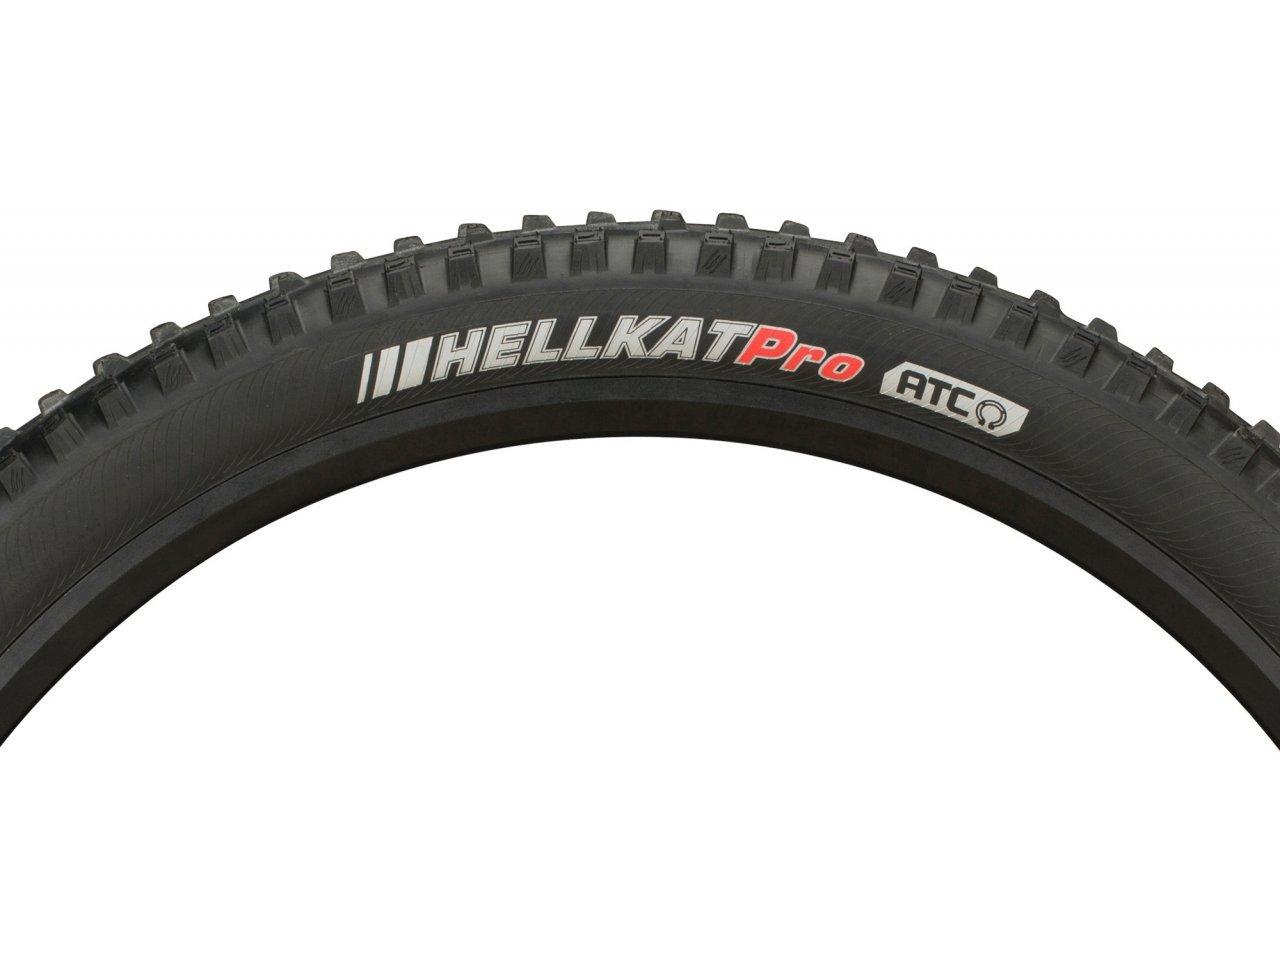 Pneu Bike Downhill Enduro Kenda 27.5x2.40 Hellkat Pro ATC Kevlar Tubeless